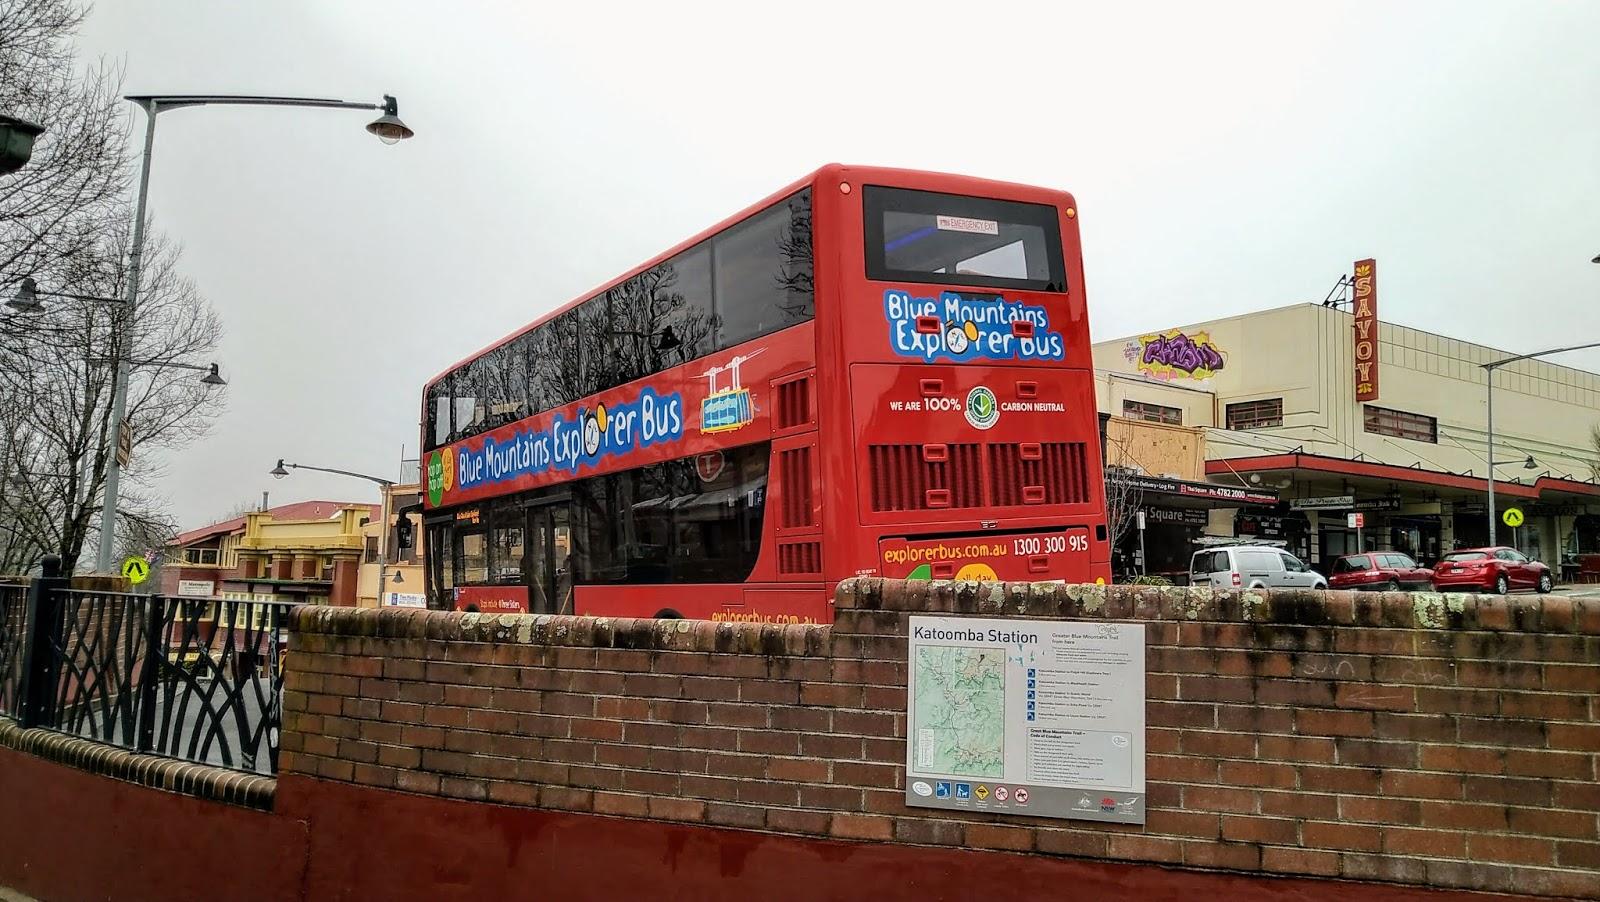 Bus Wisata, Katoomba, Sydney, New South Wales, Australia, irfan-room.com